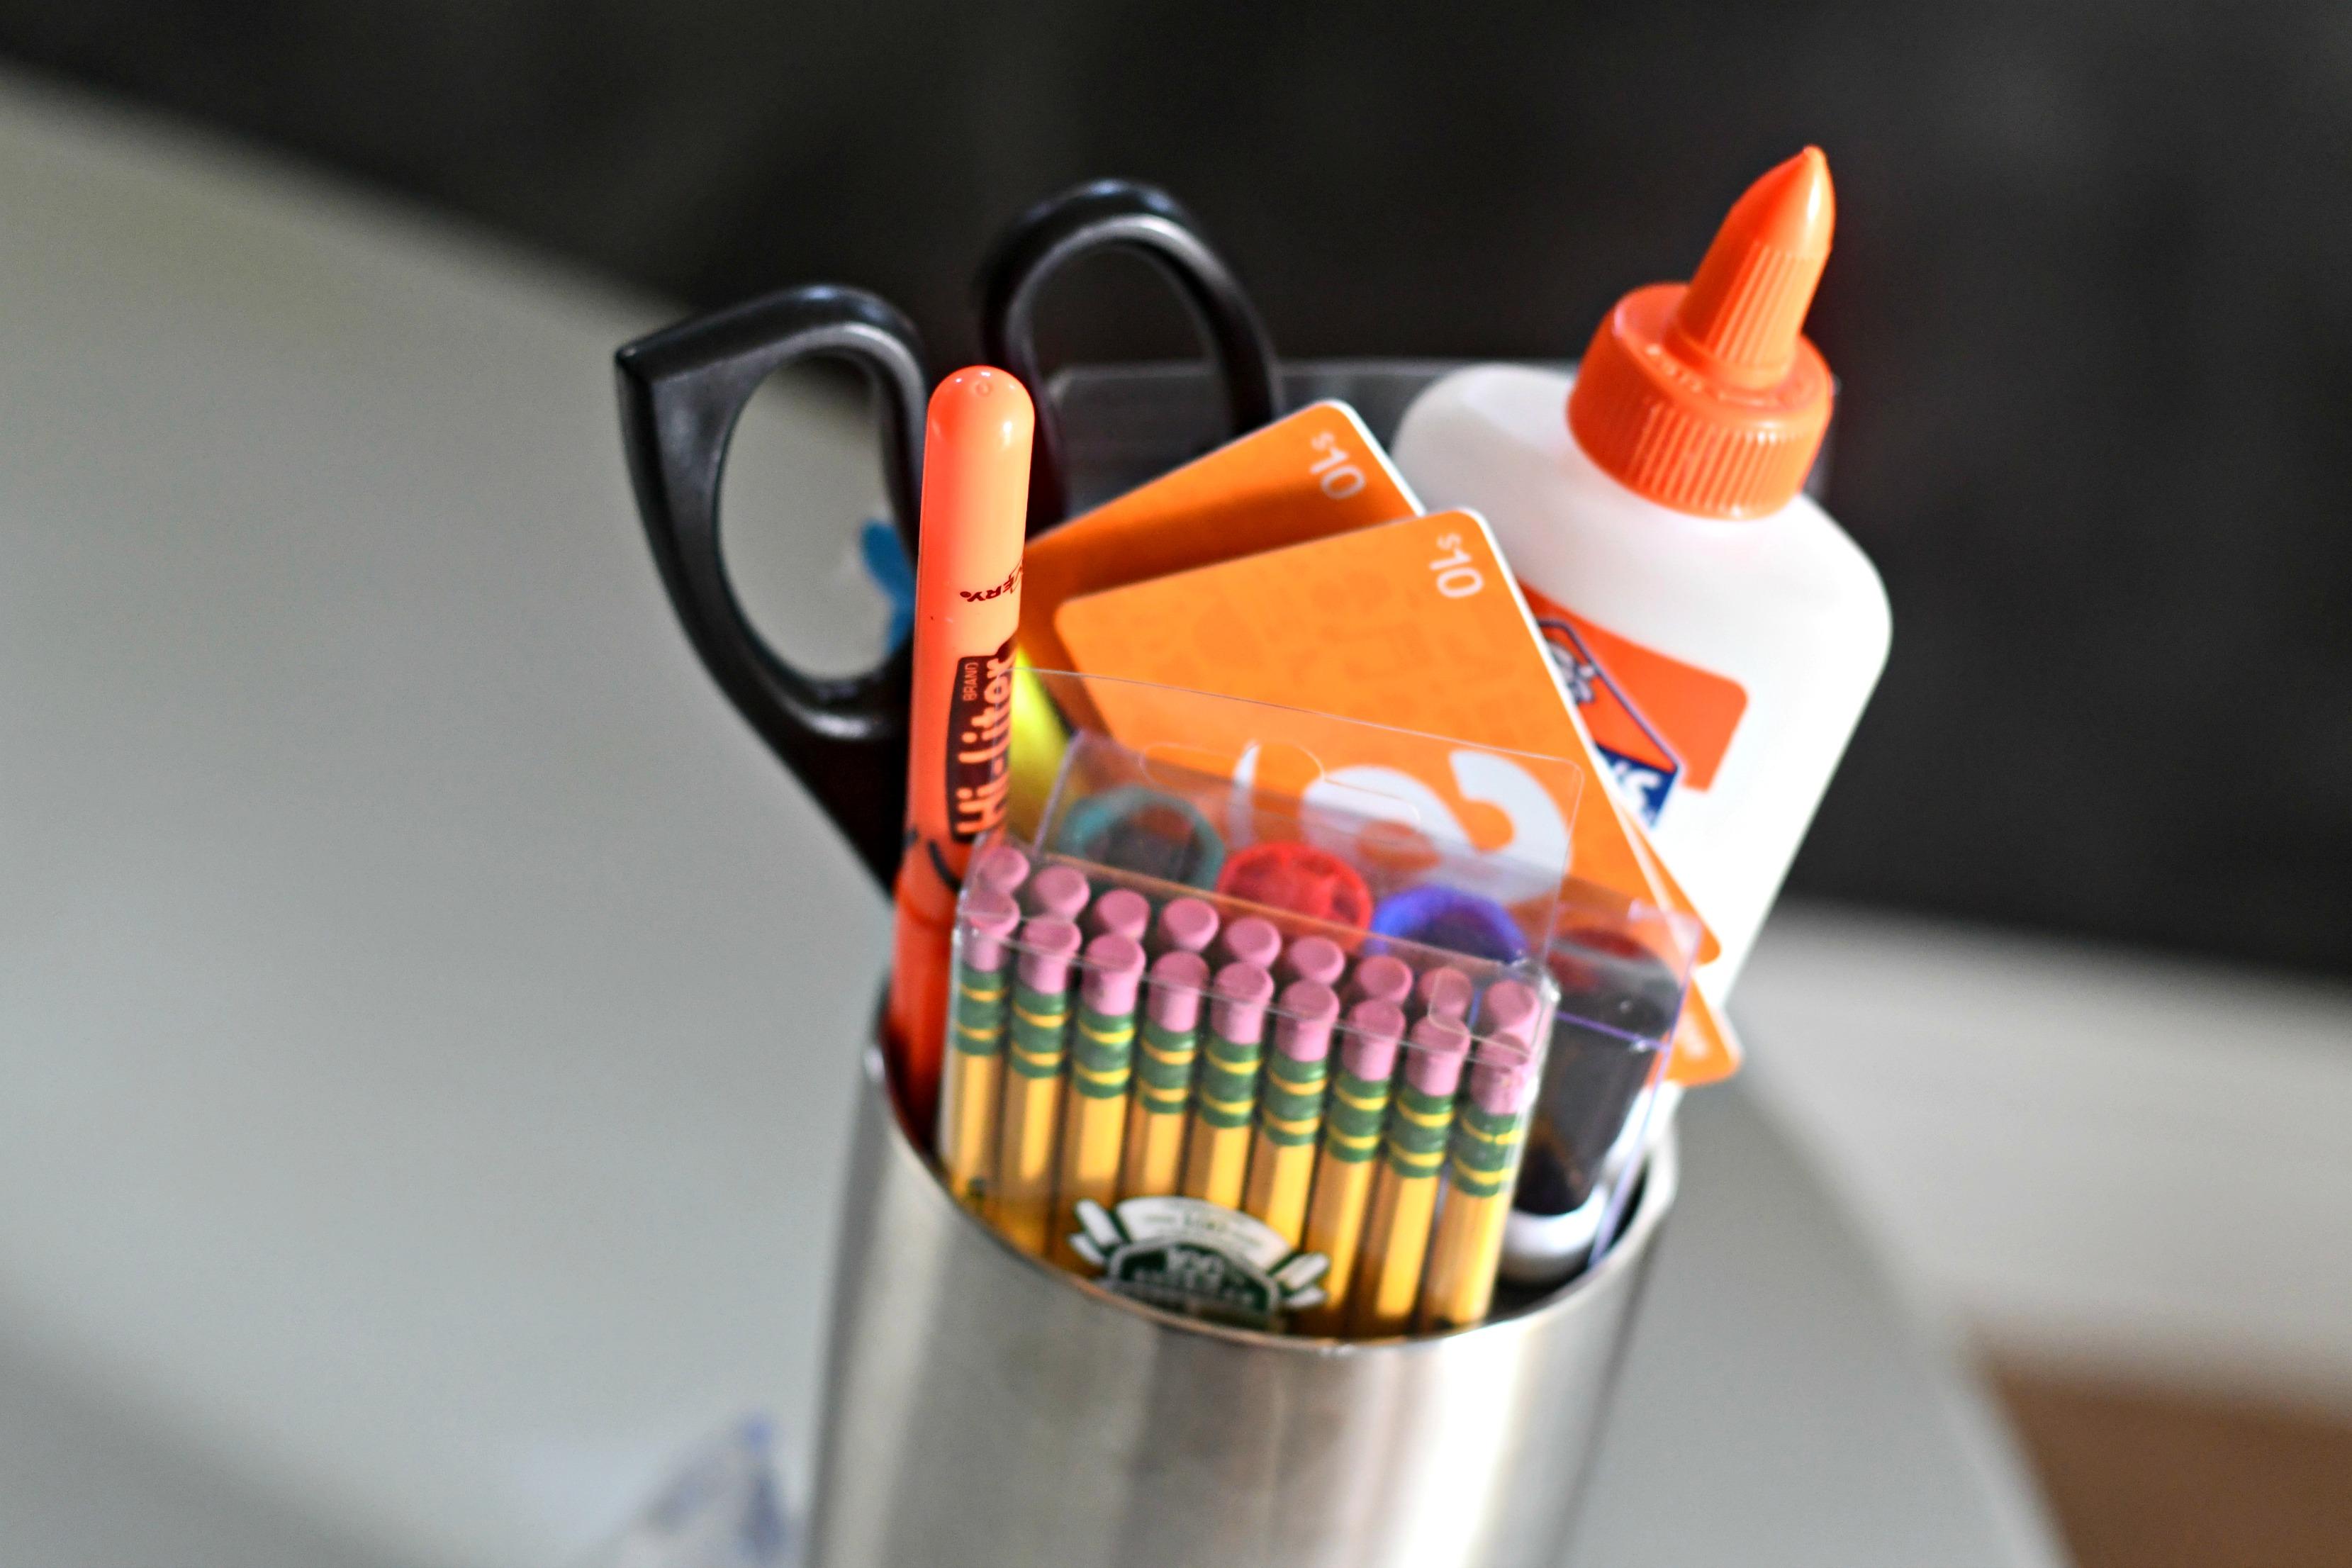 DIY Tumbler Gift basket ideas – Teacher gift contents in the tumbler